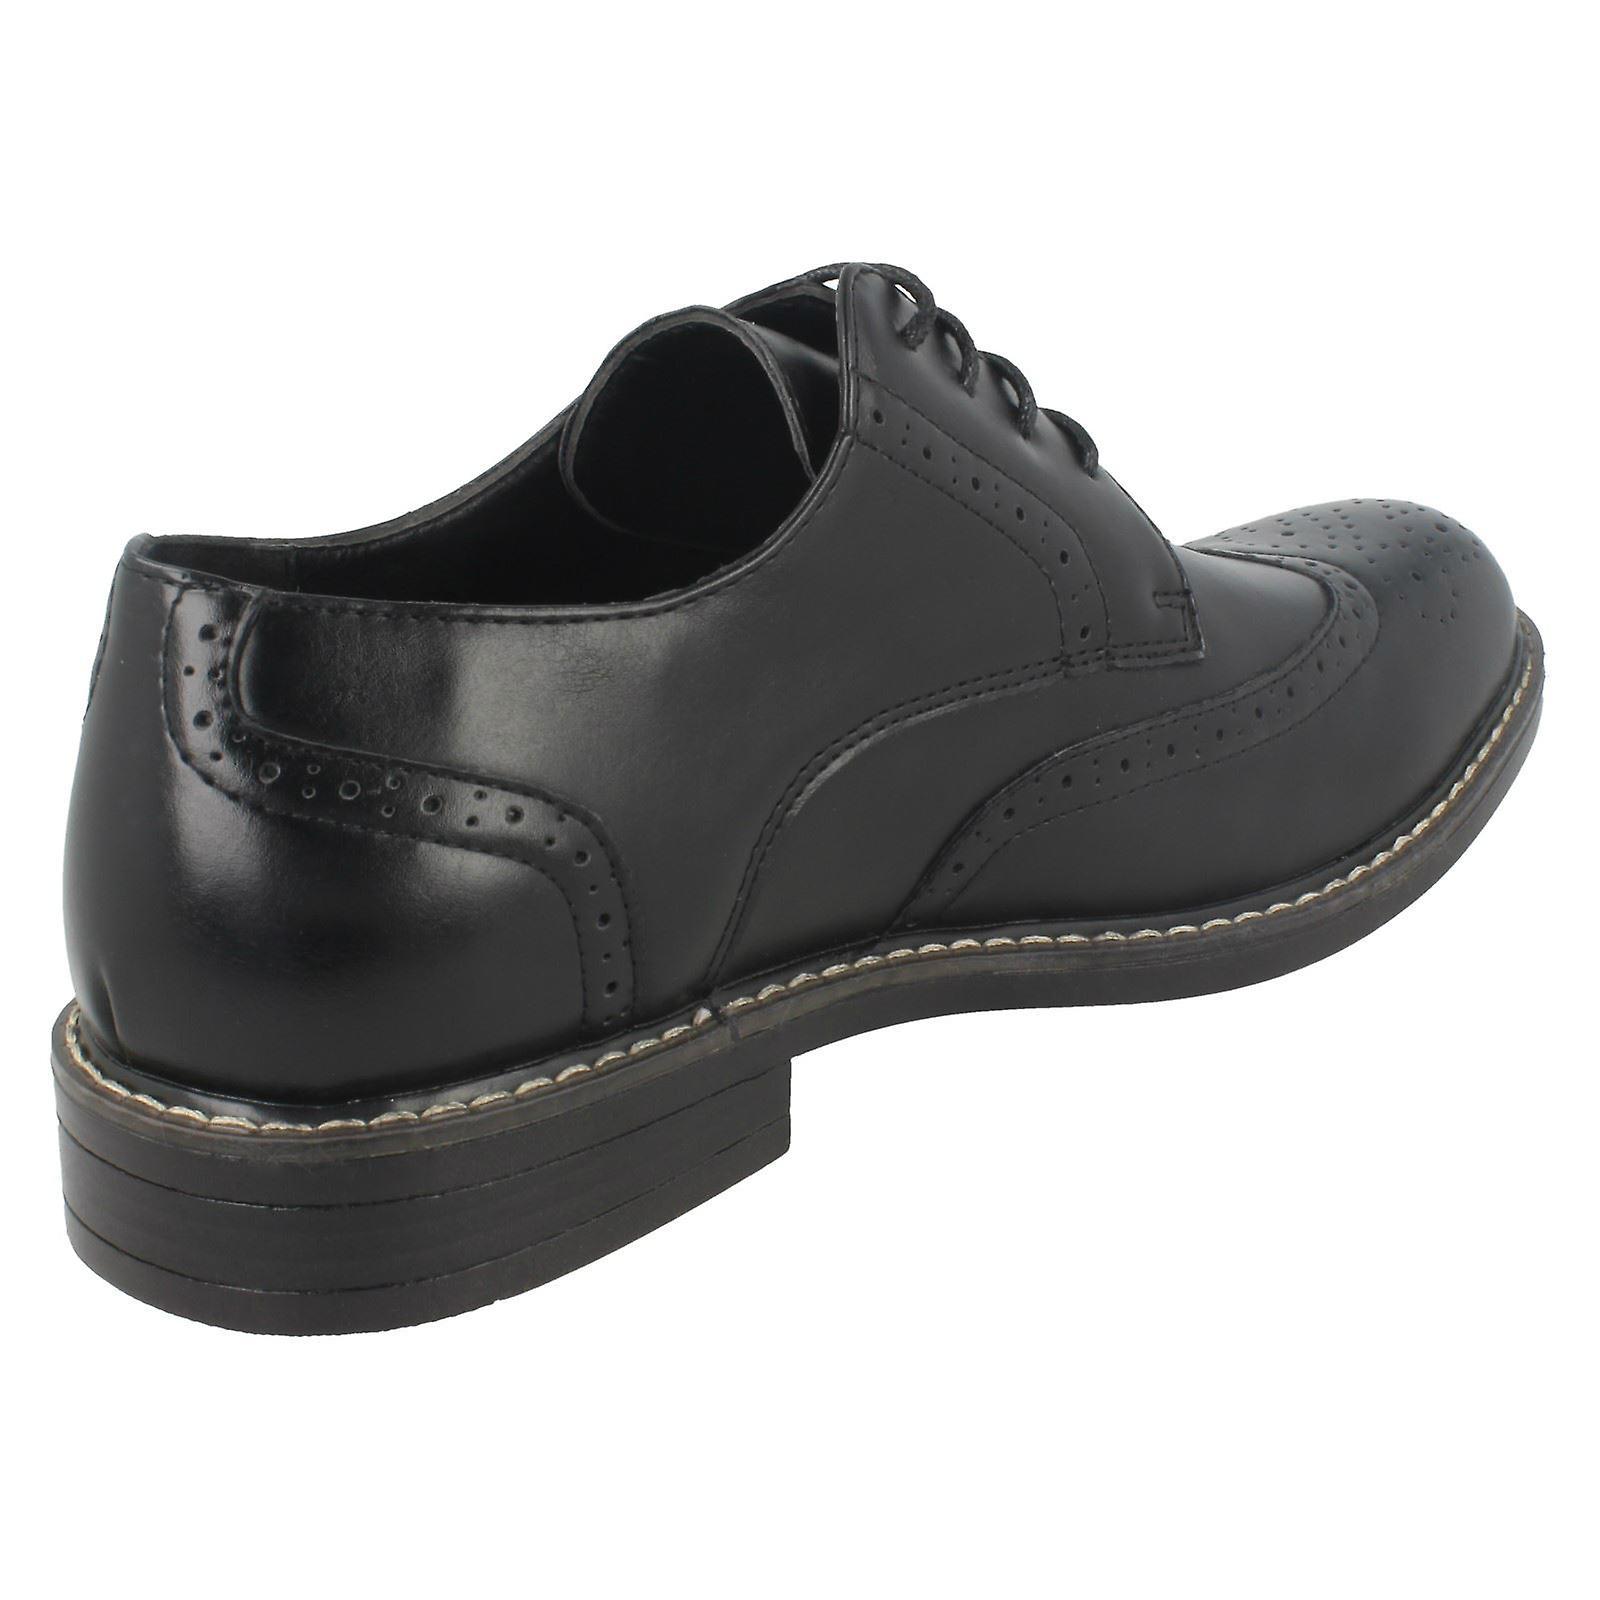 Mens Malvern Lace Up Brogue Shoes A2143